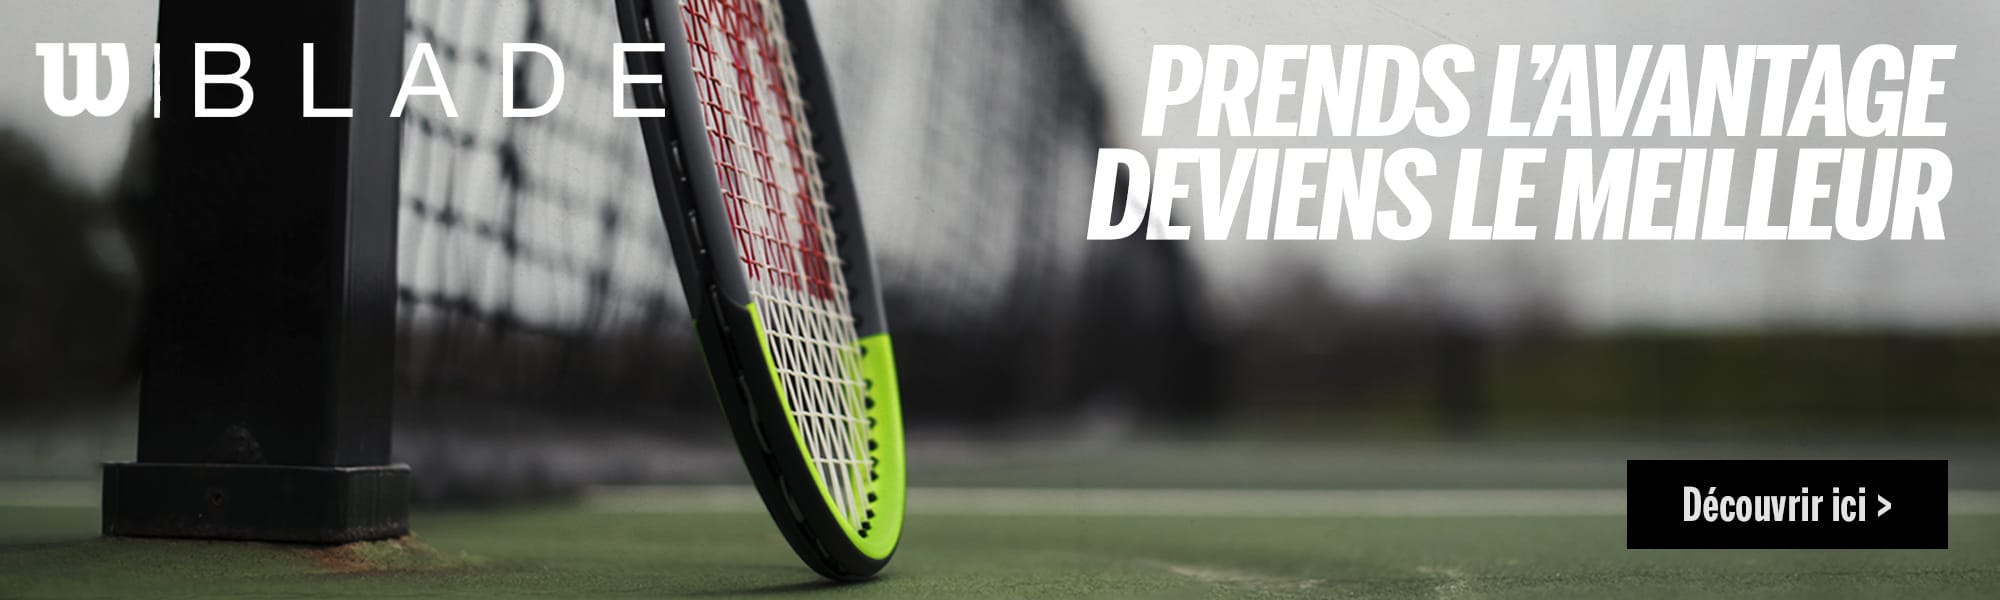 Achats tennis : magasin de tennis, squash, badminton en